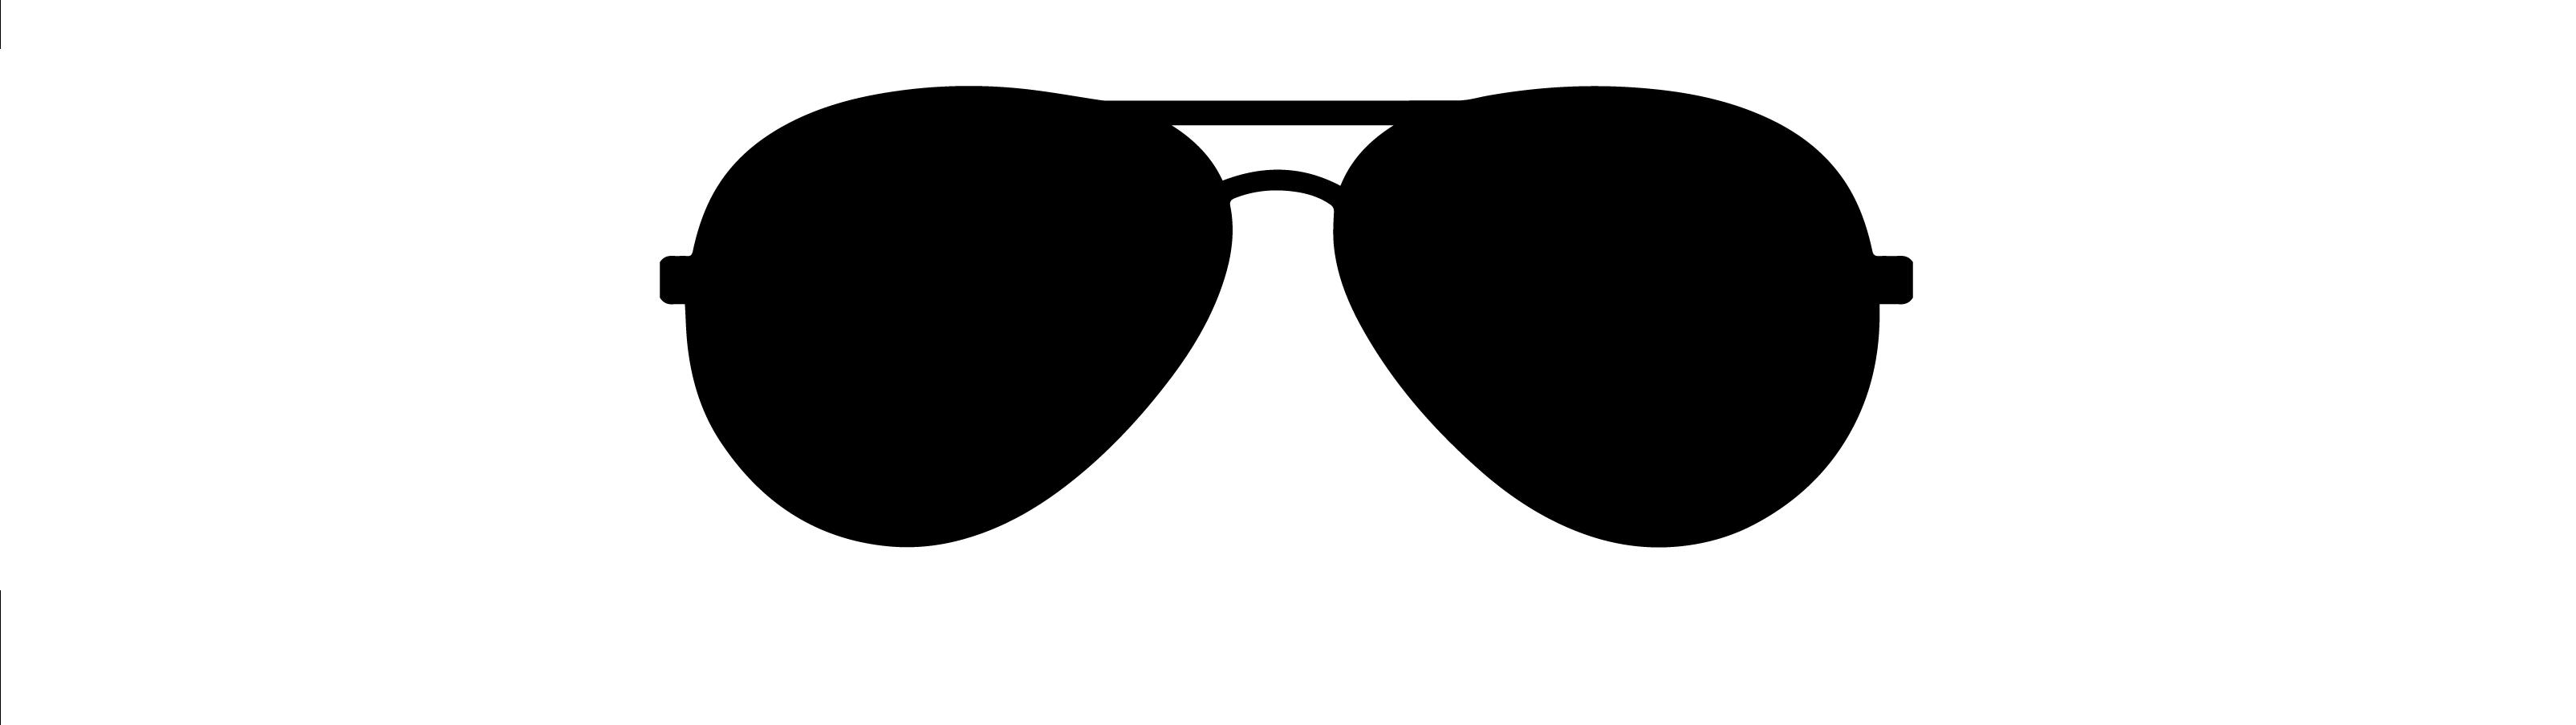 Sun glasses clipart black and shite svg freeuse library Black Sunglasses Clip Art svg freeuse library